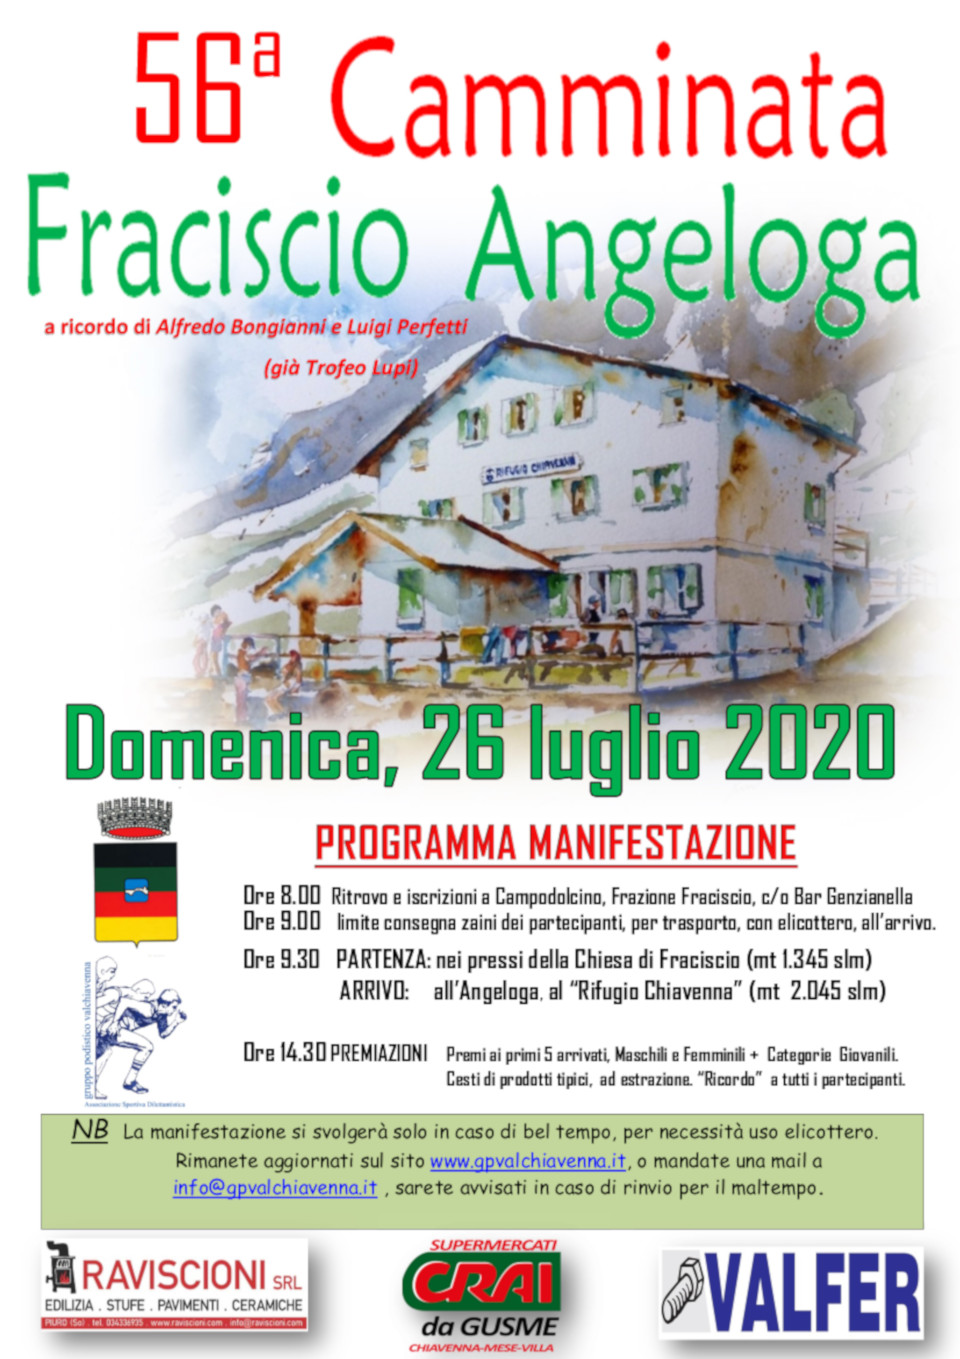 Camminata Fraciscio-Angeloga